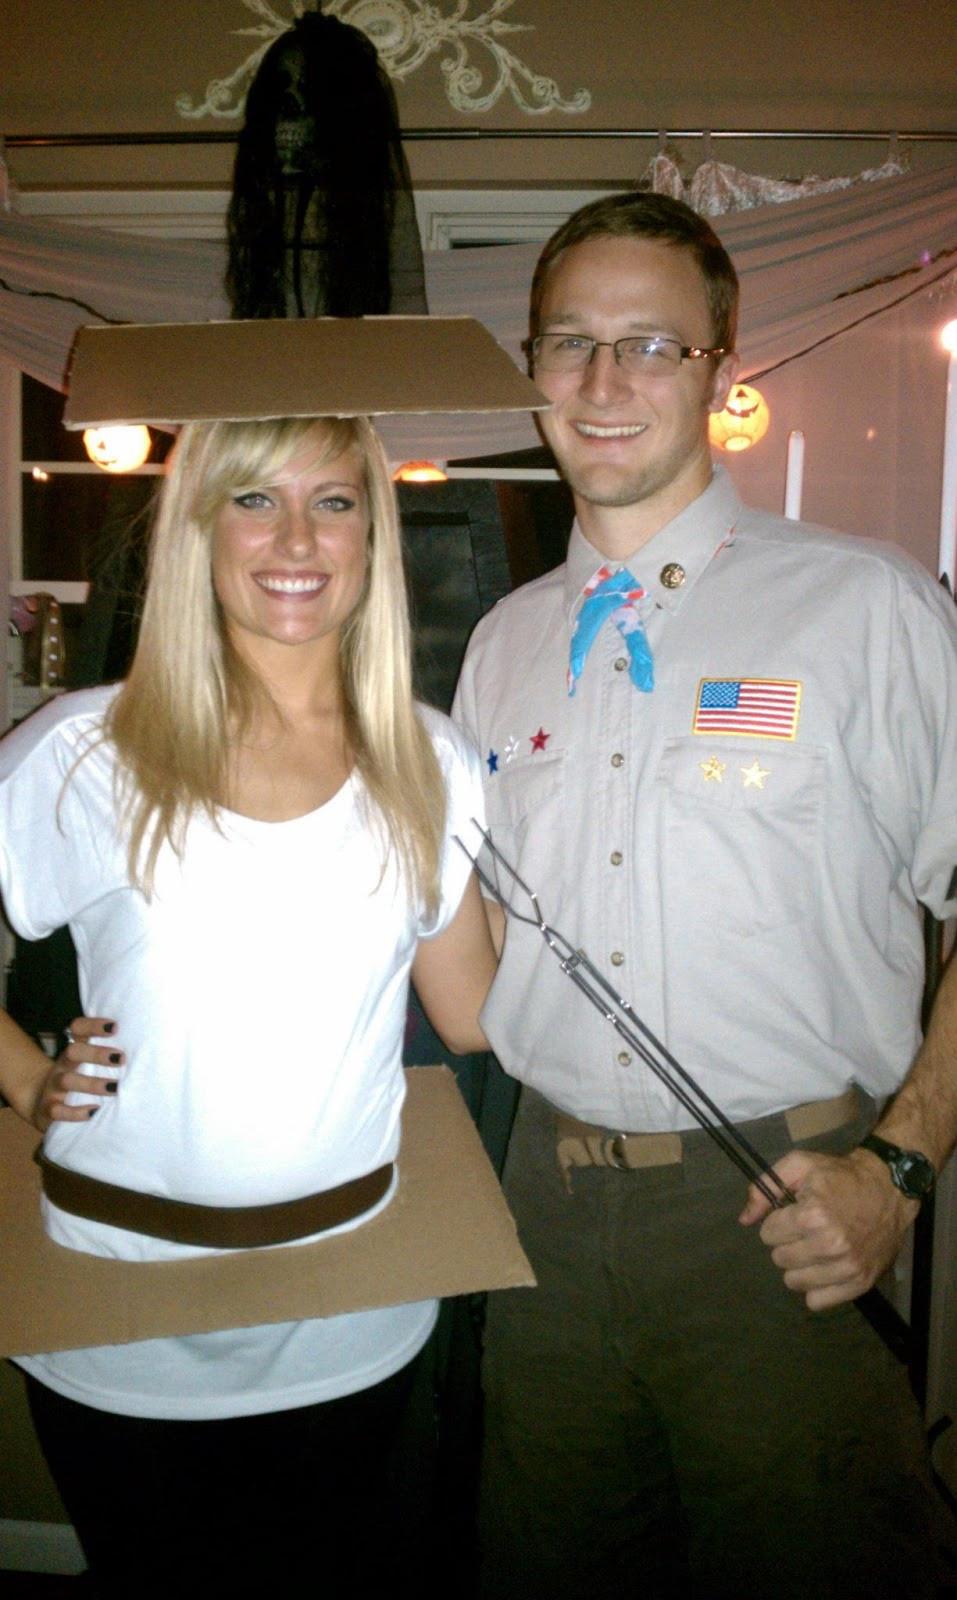 DIY Couple Costumes Ideas  Katie in Kansas DIY Couples Halloween Costume Ideas